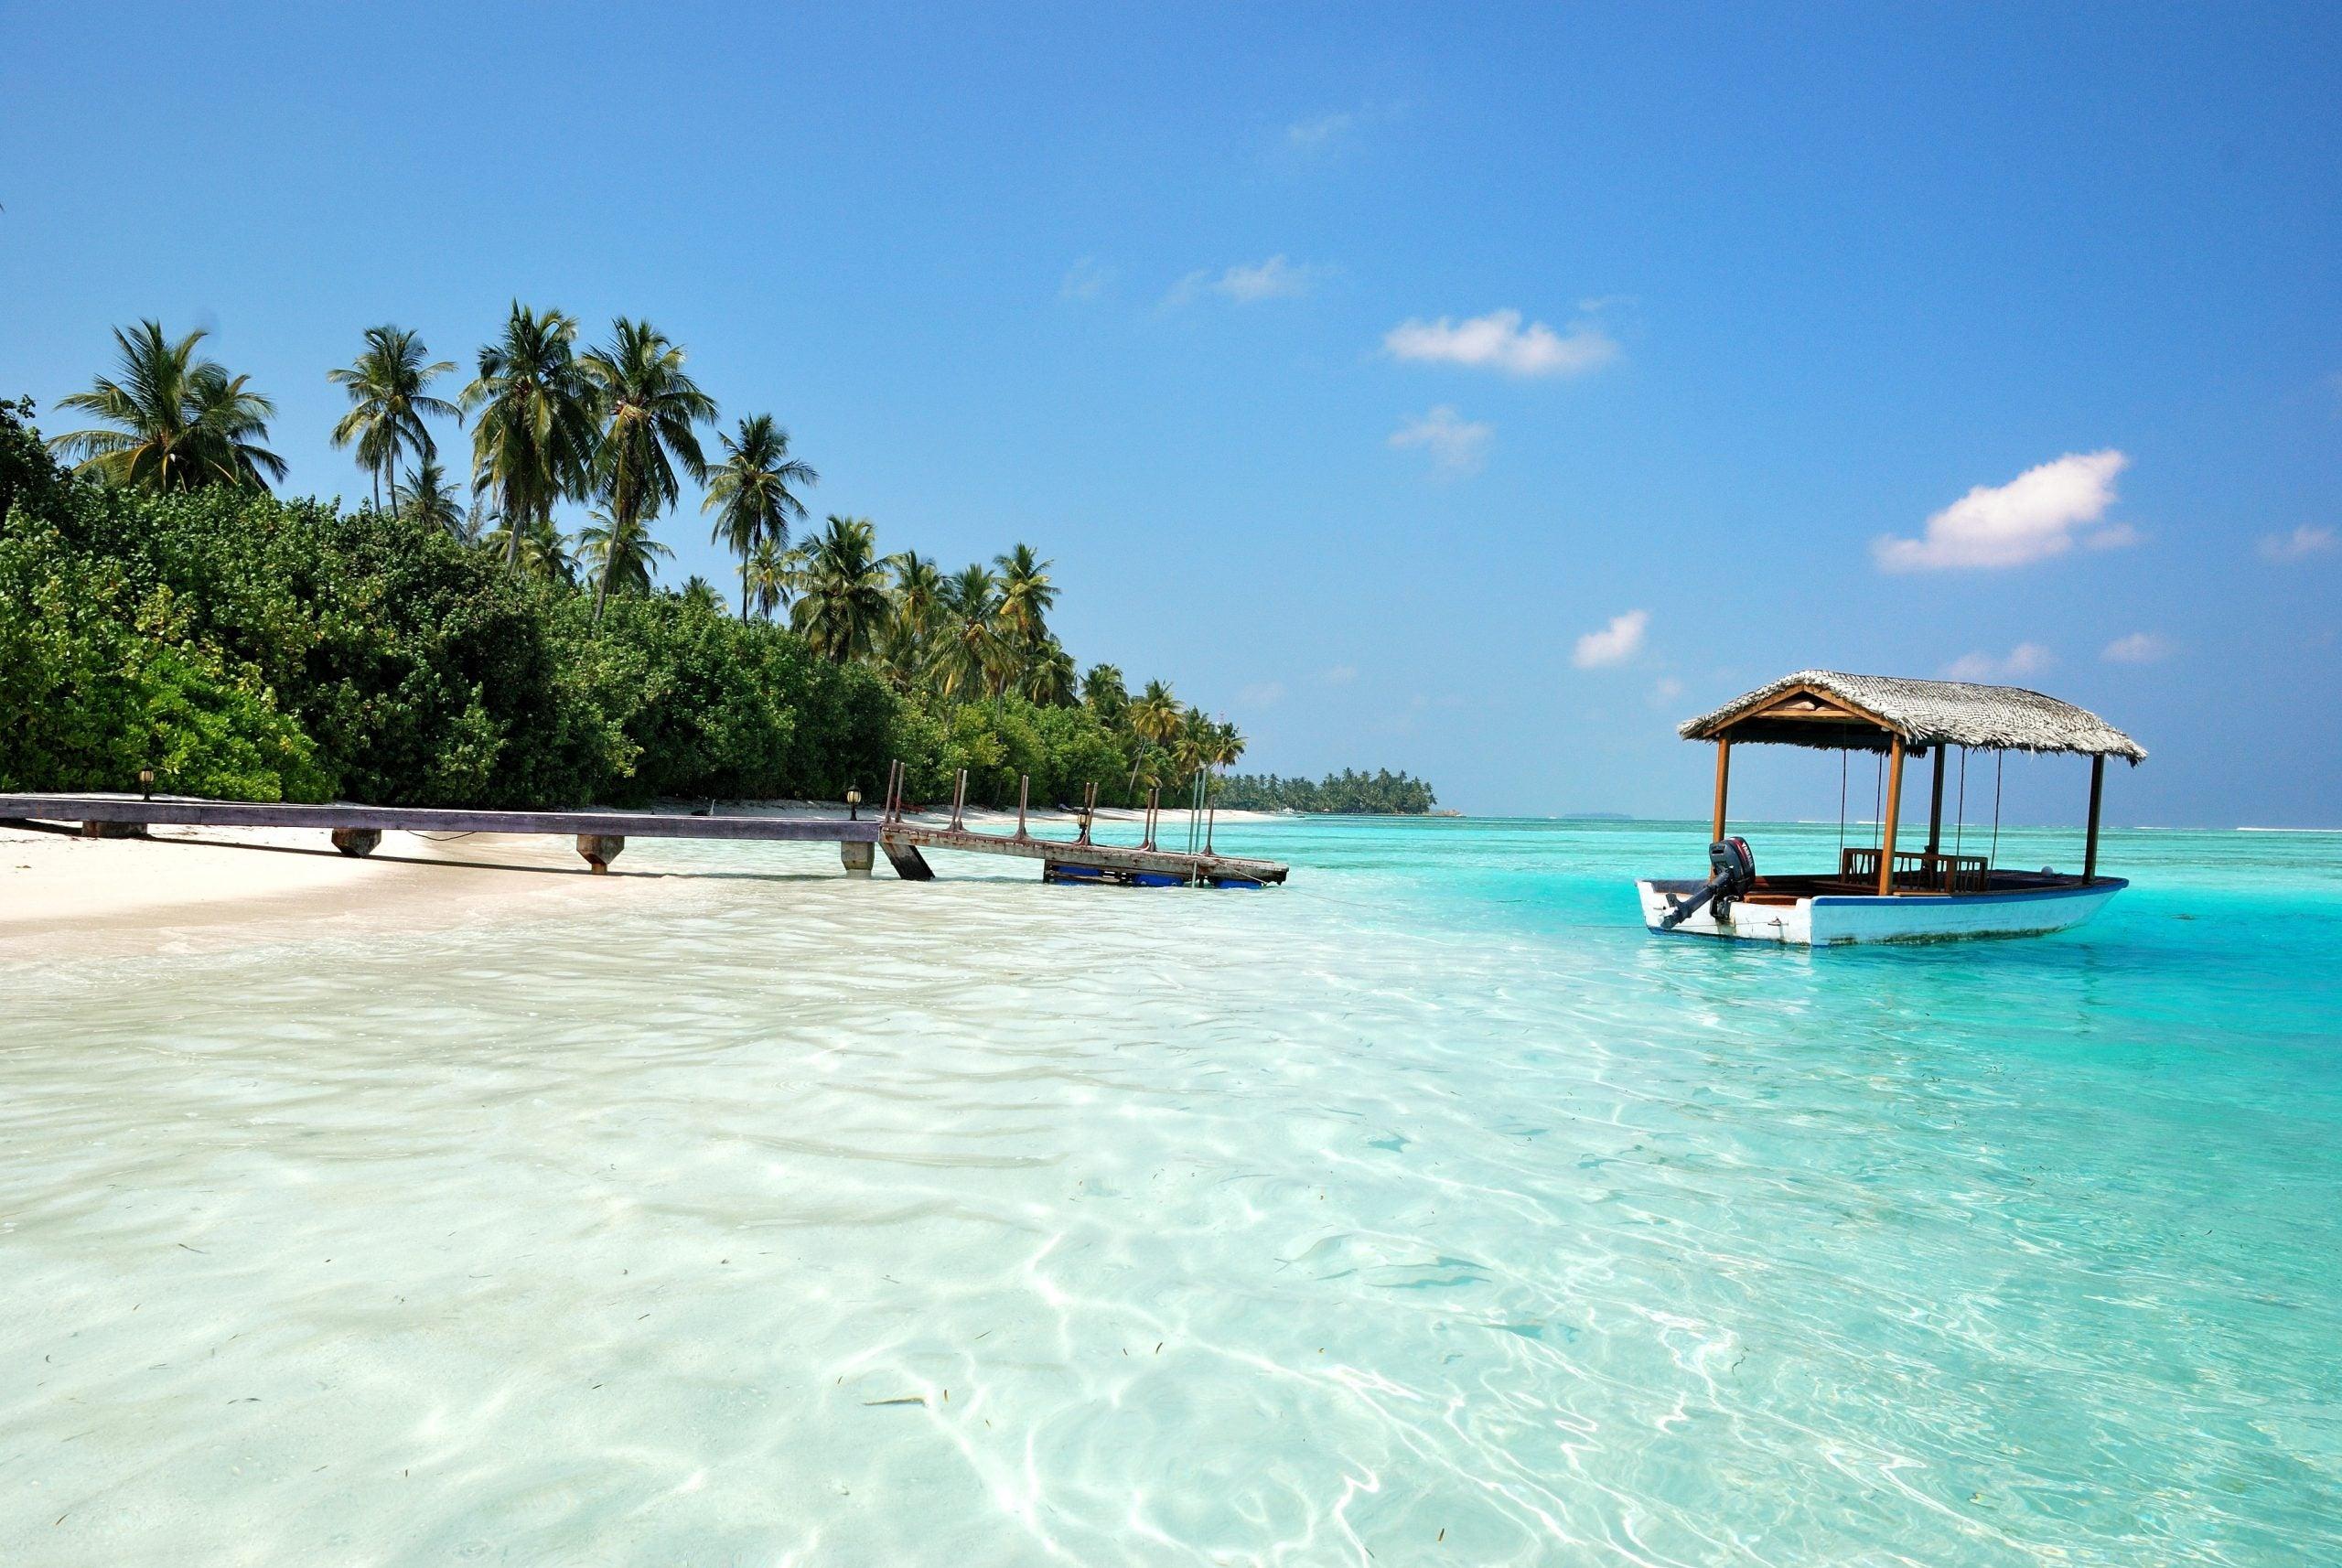 Hot in November: The Maldives